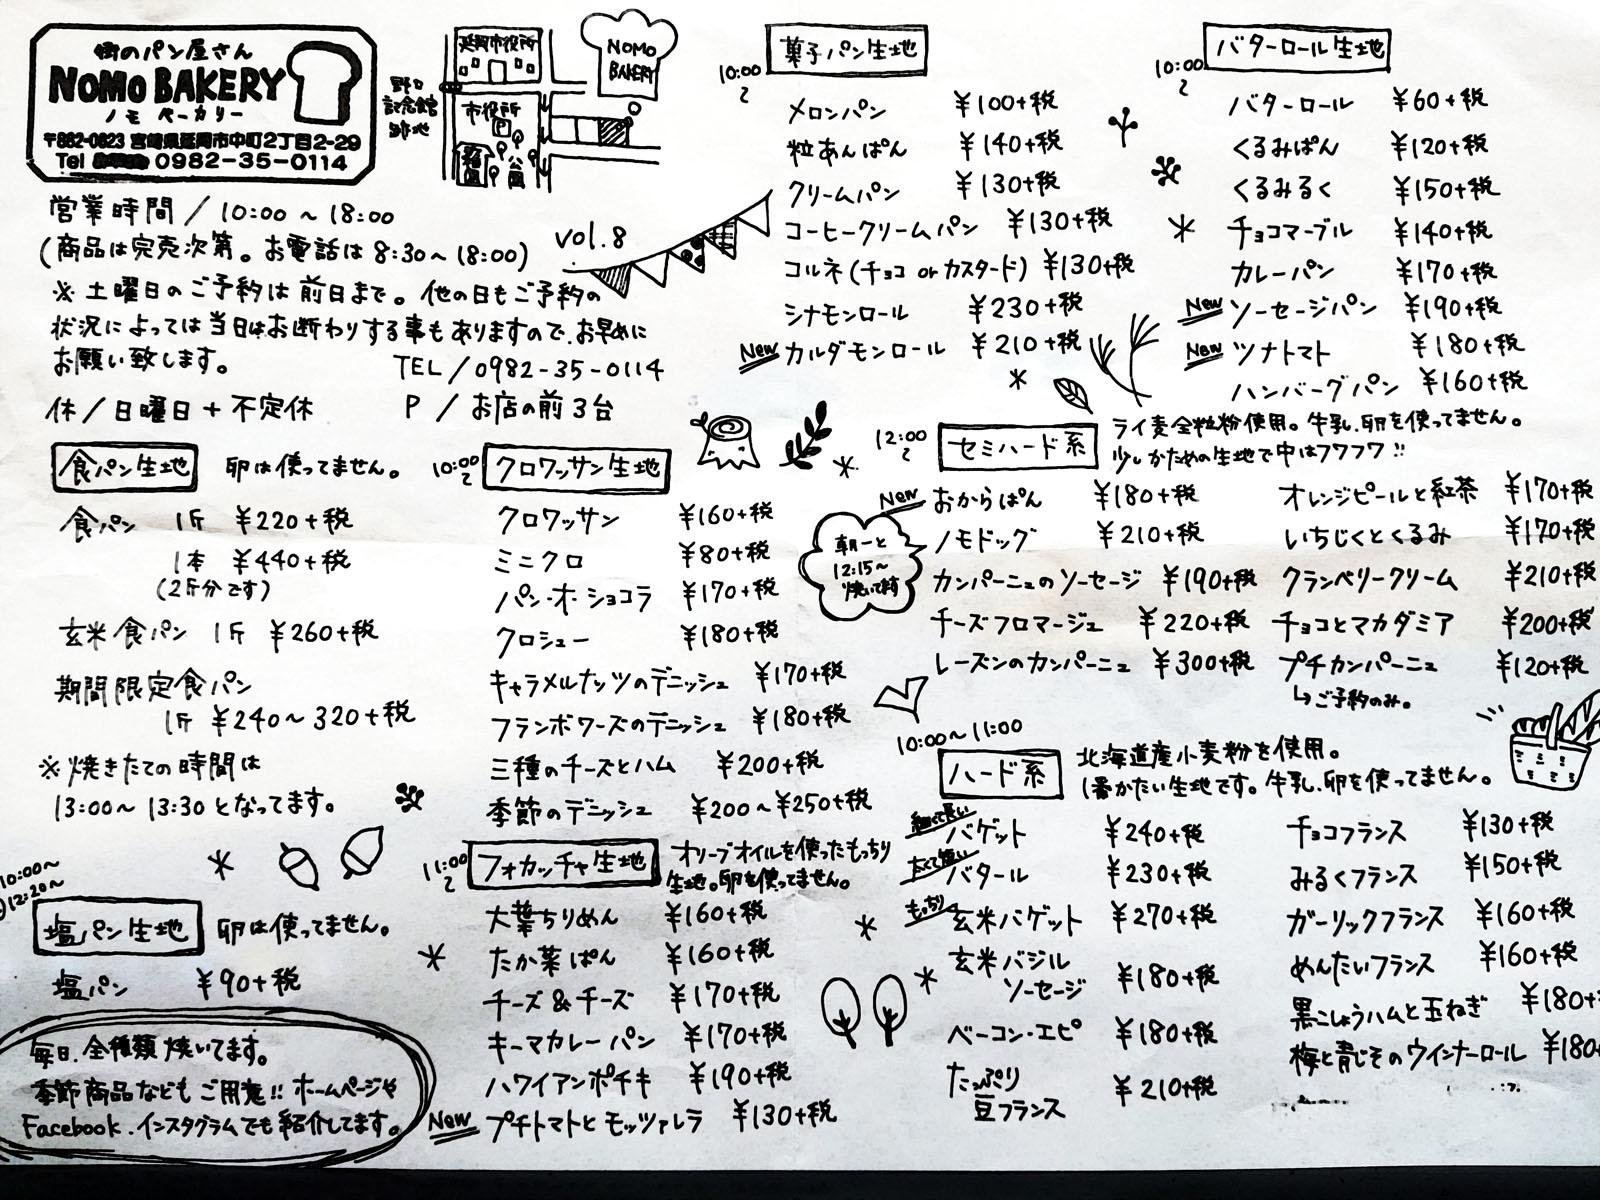 5_nomo_menu.jpg